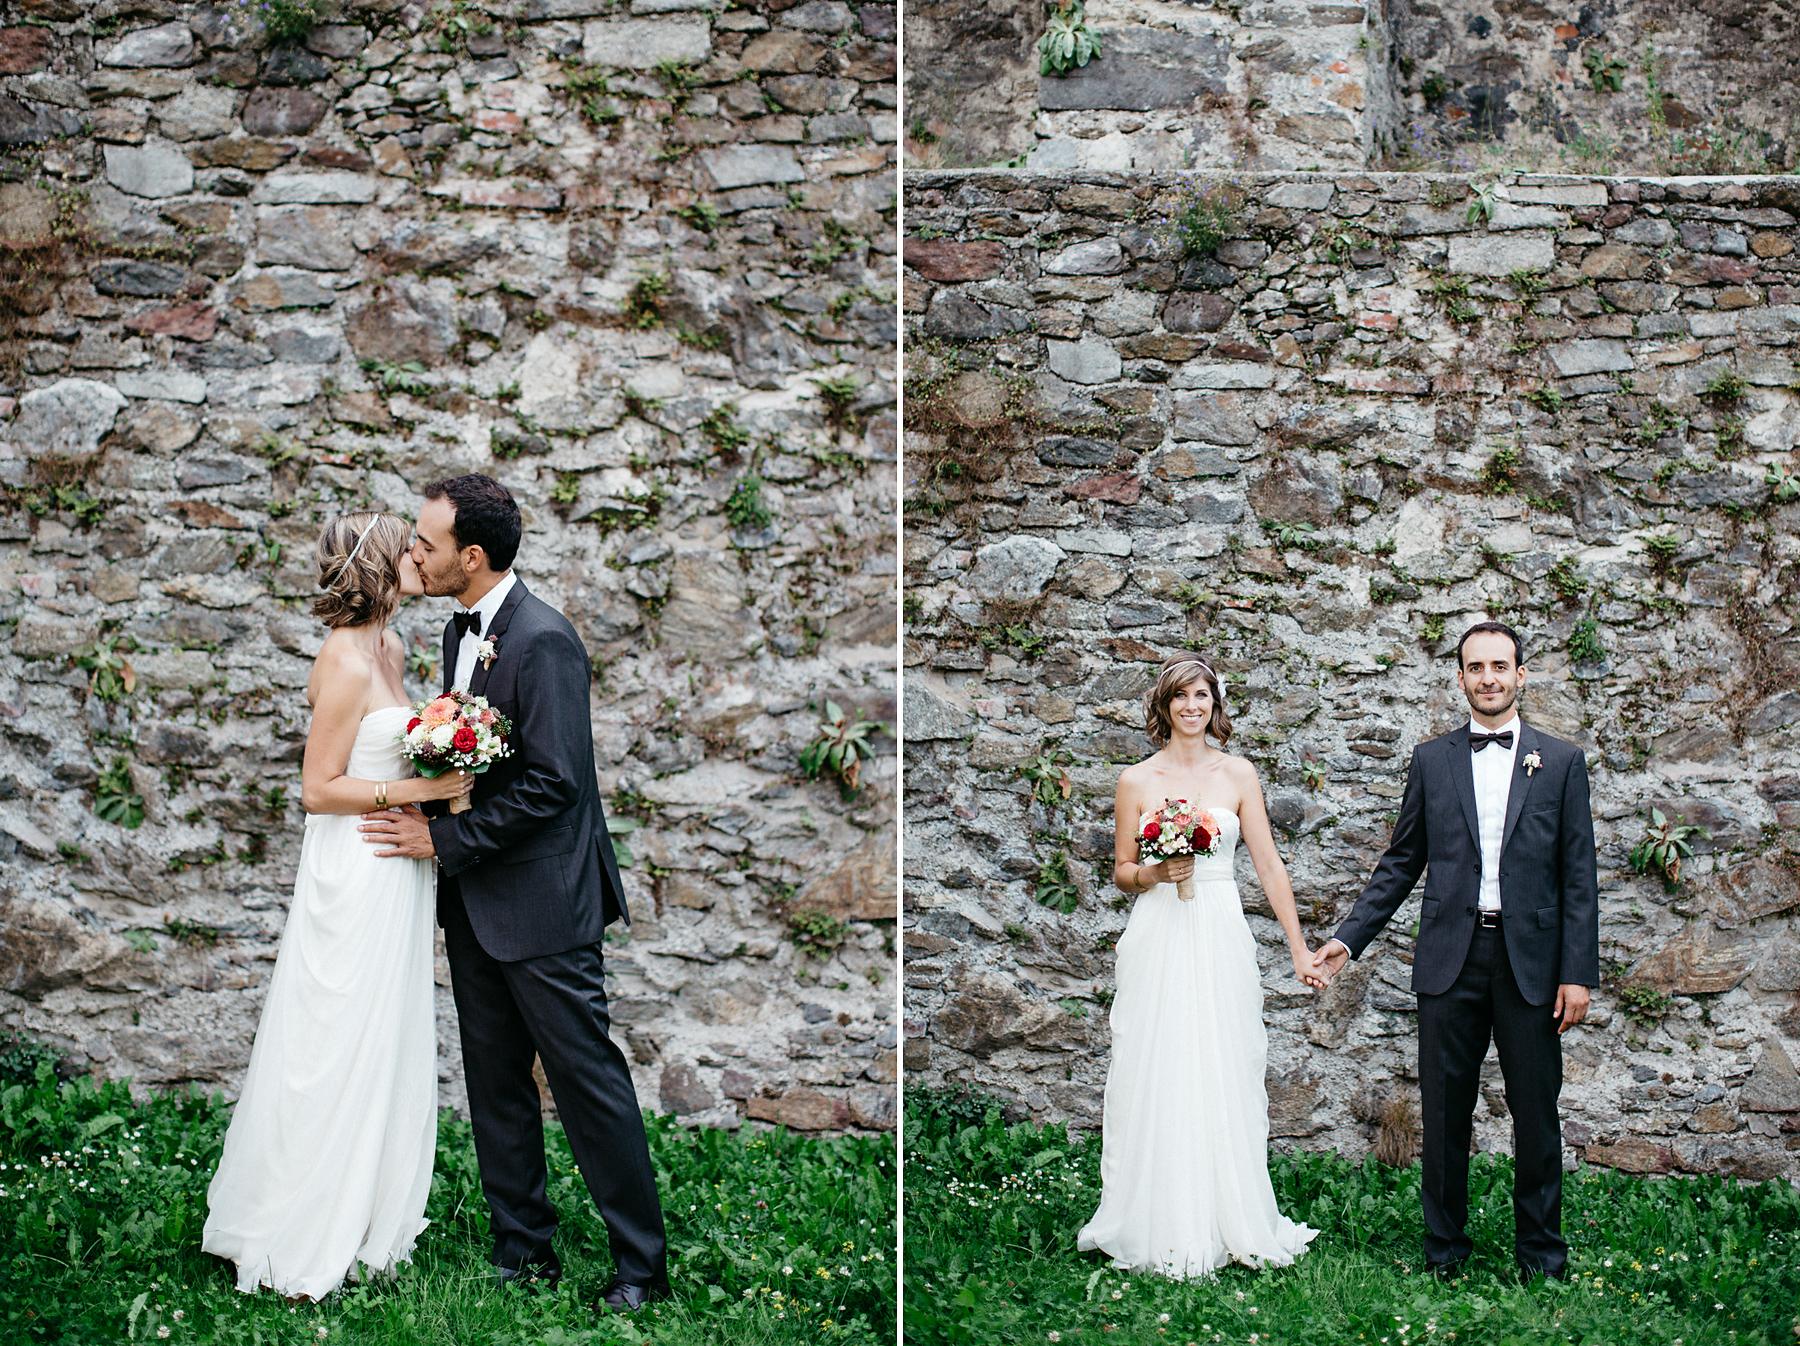 Hochzeit Schlossbrasserie Linz